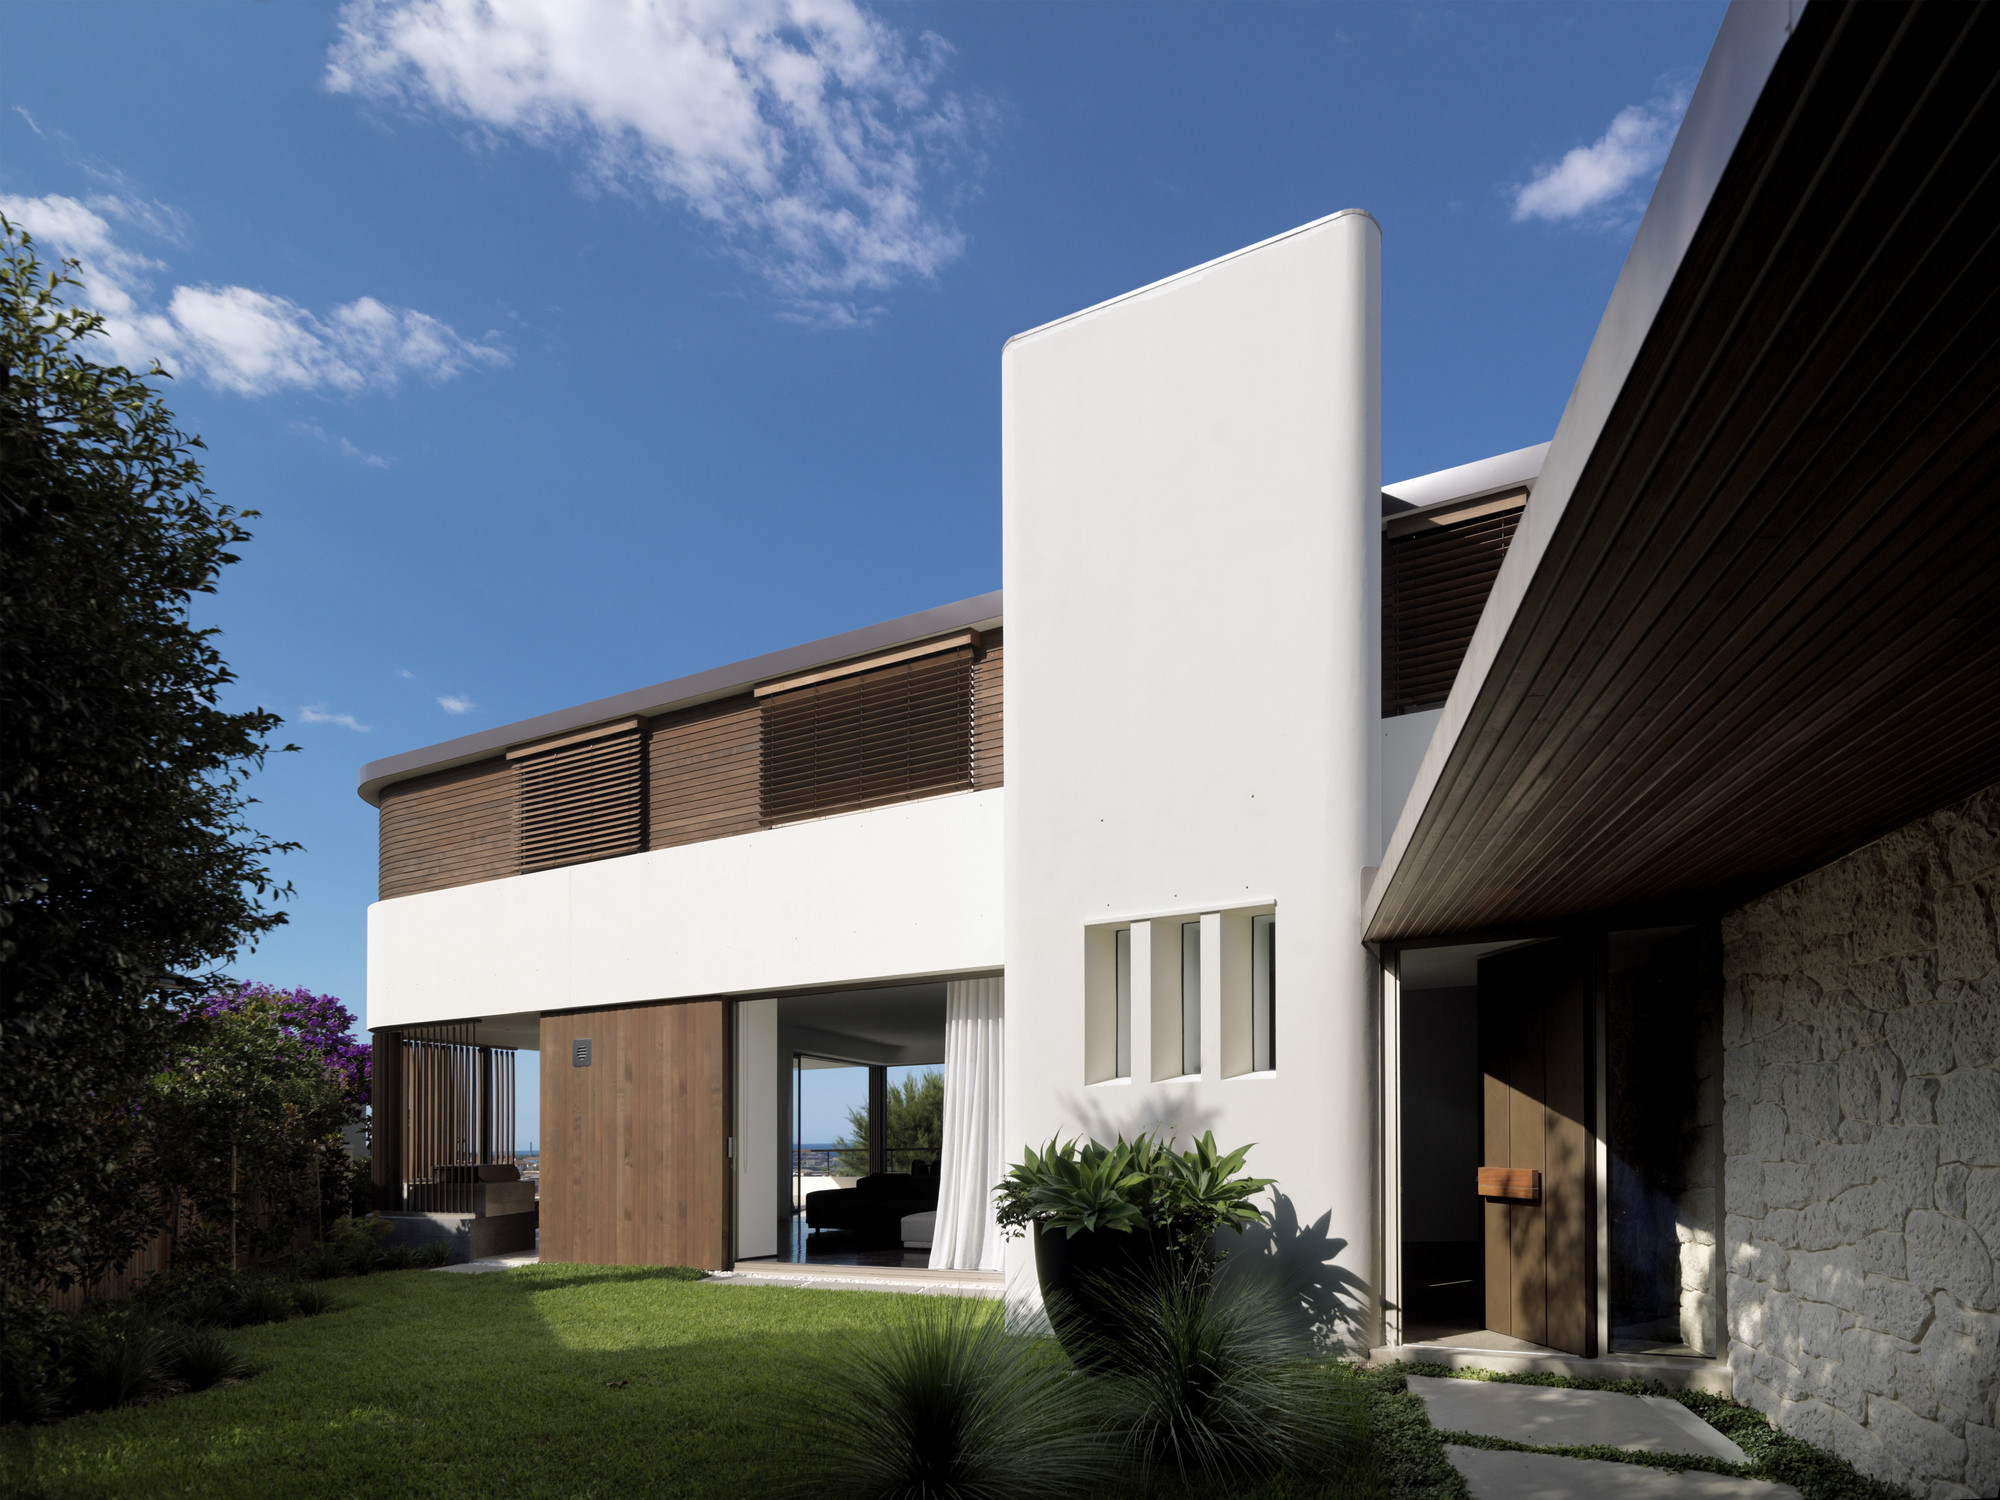 Balcony Over Bronte  / Luigi Rosselli Architects, © Justin Alexander